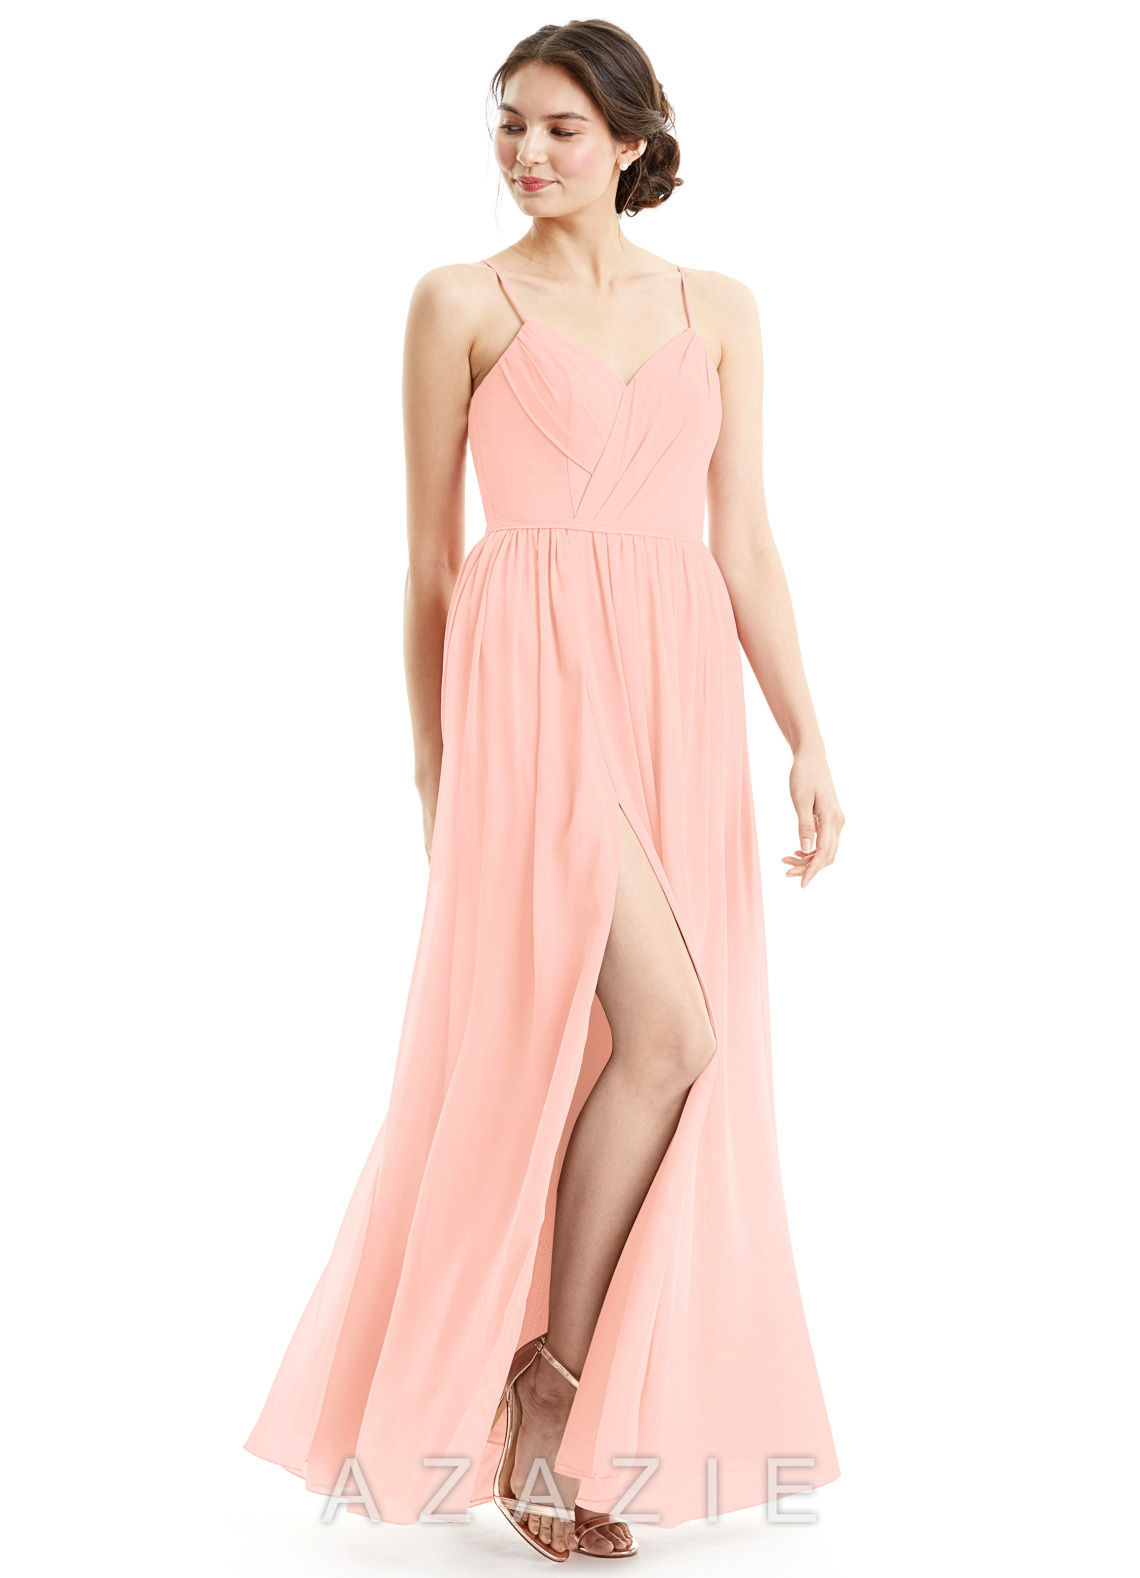 Azazie cora bridesmaid dress azazie loading zoom ombrellifo Gallery